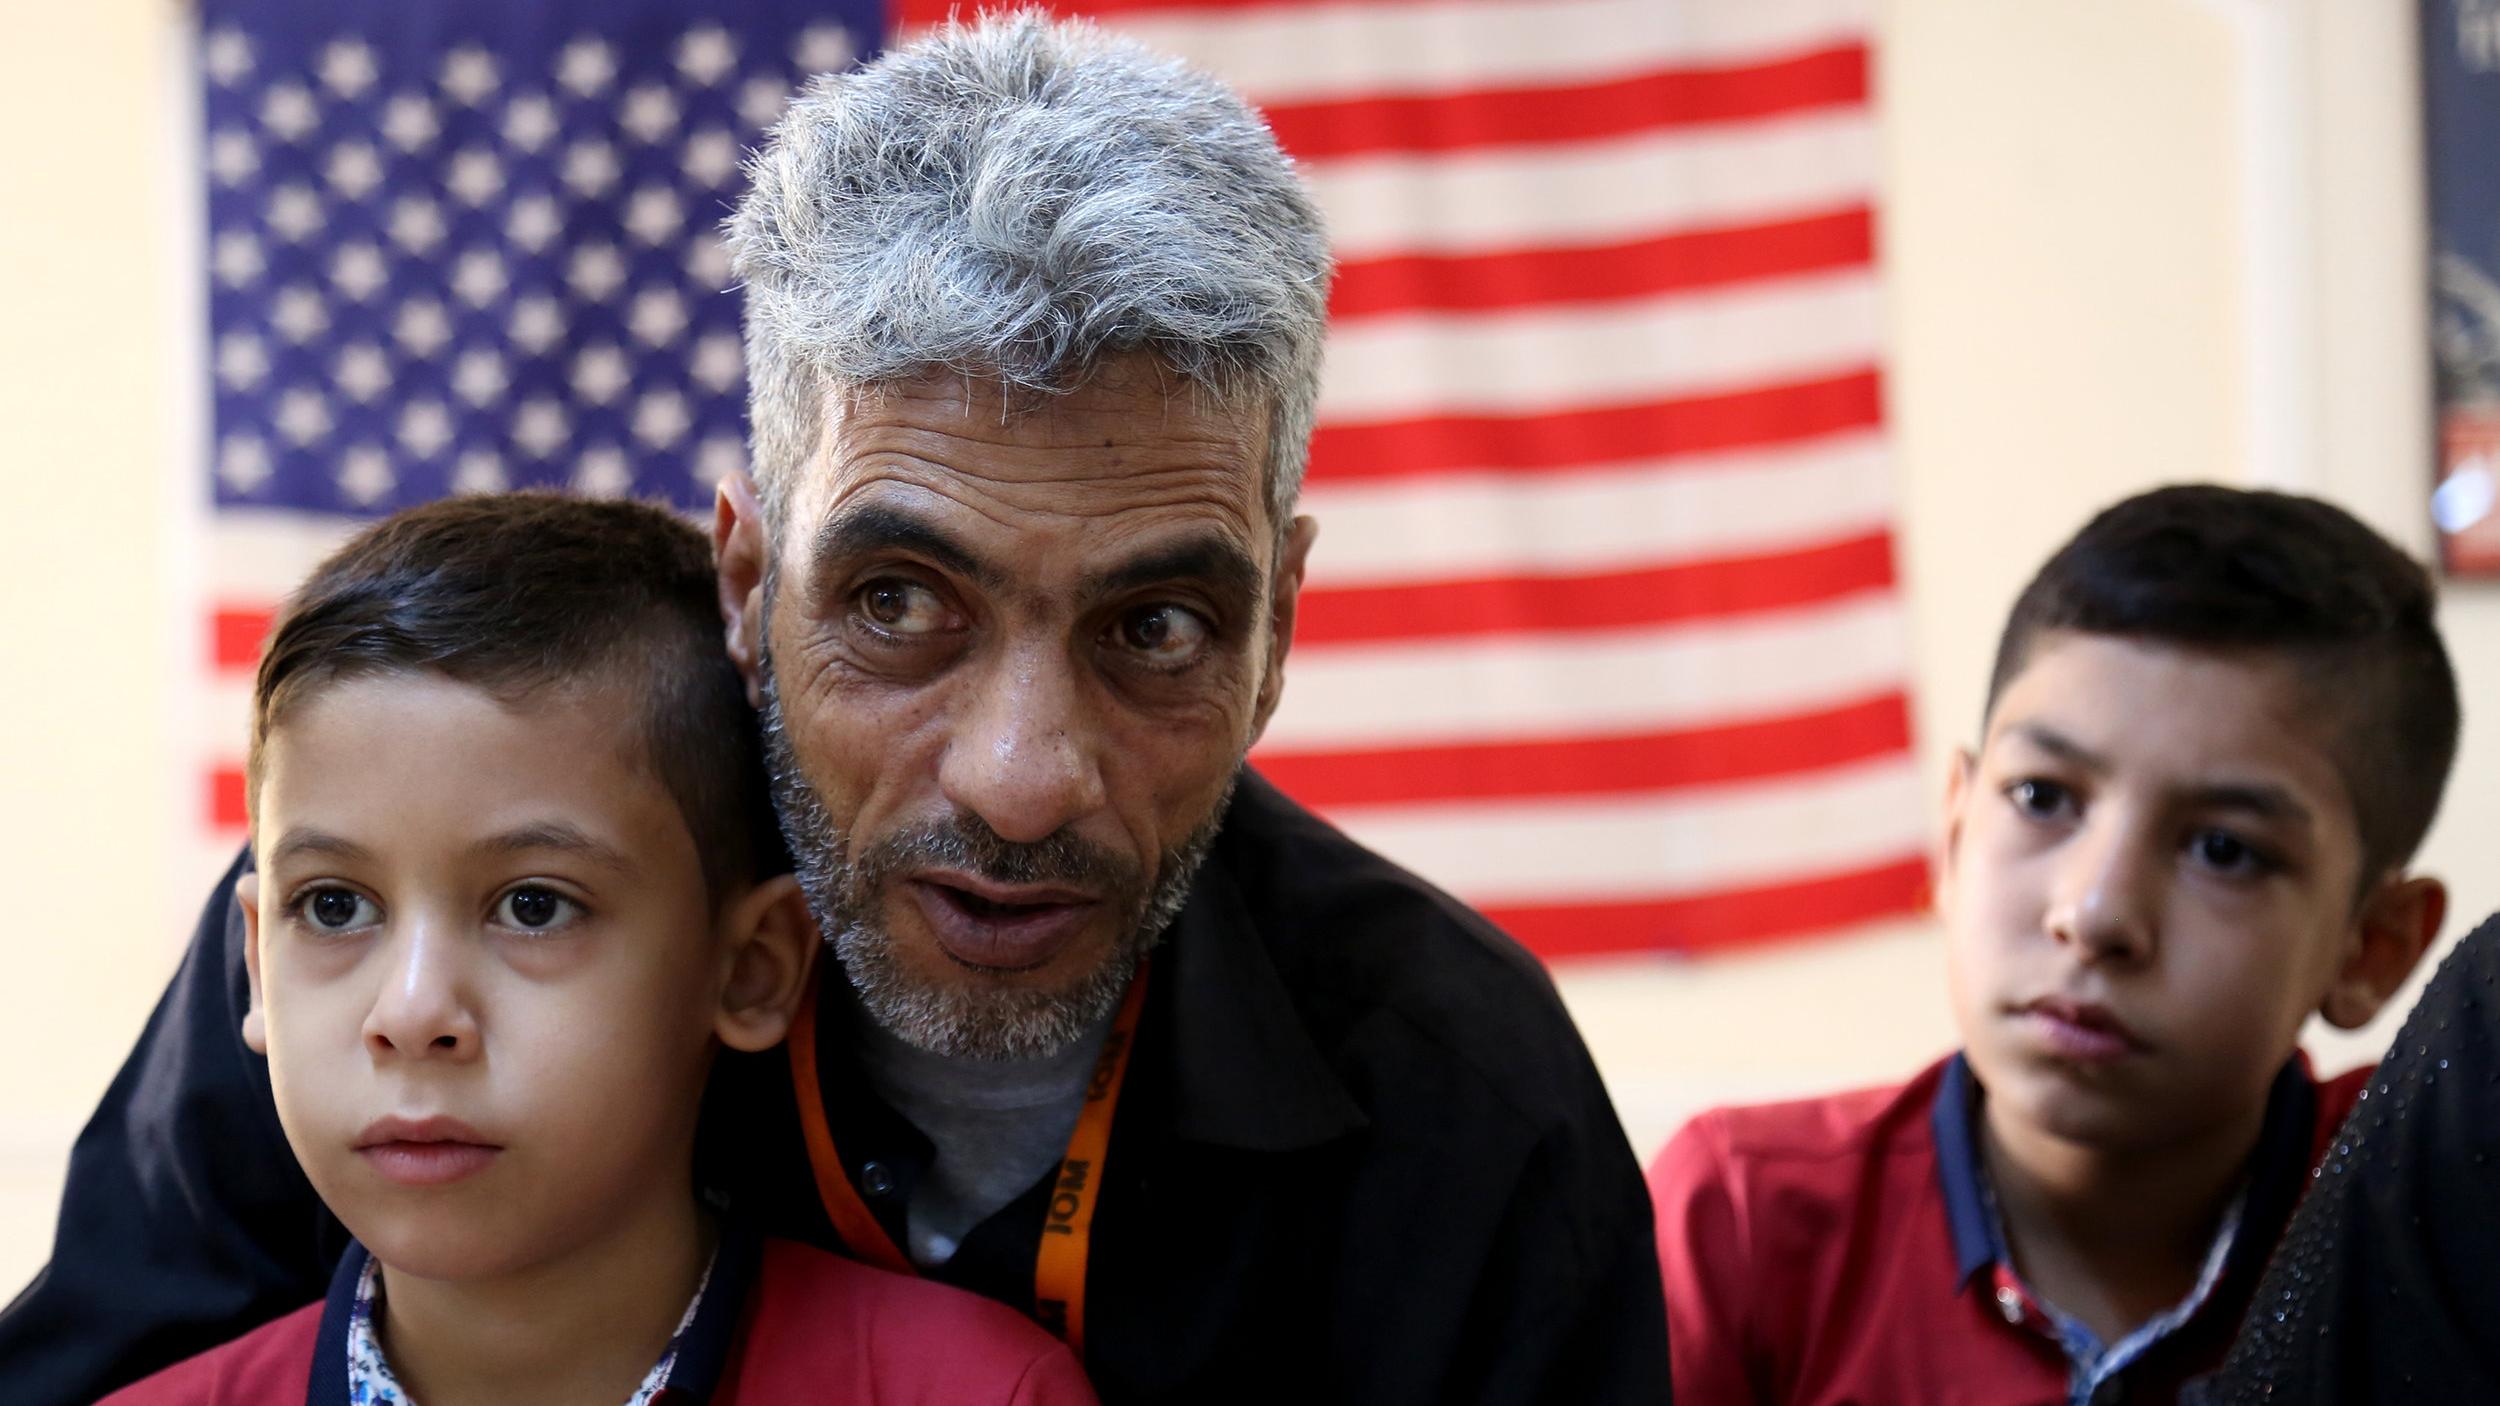 Raad Adayleh / The Associated Press